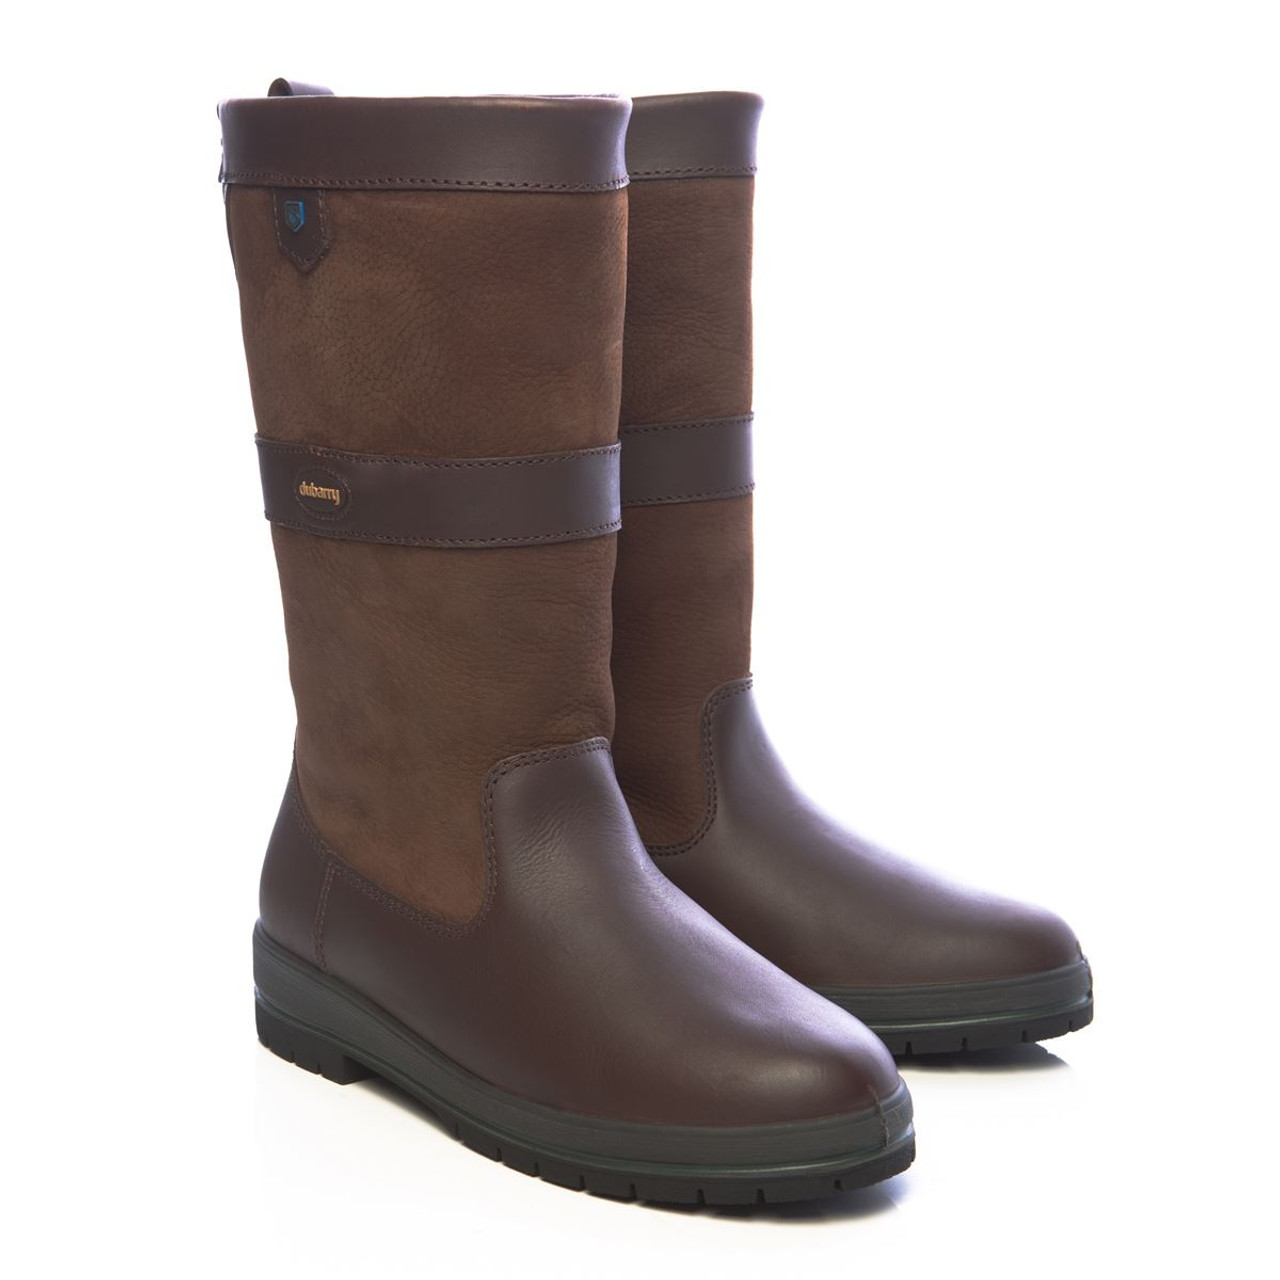 Dubarry Kildare Boots in Walnut